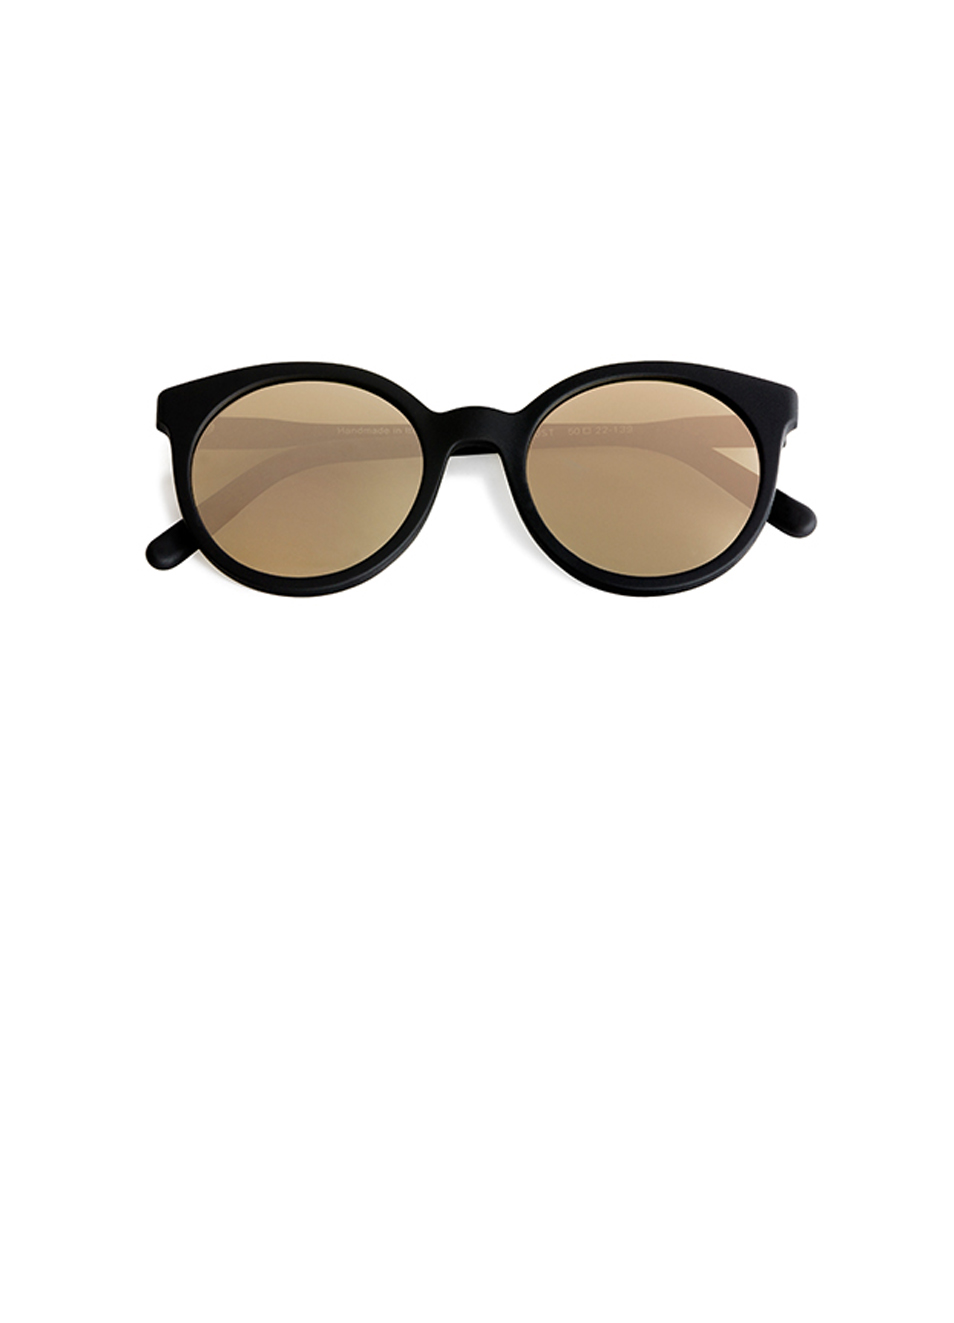 Stardust model sunglasses - Spektre - Manecapri 47602356260